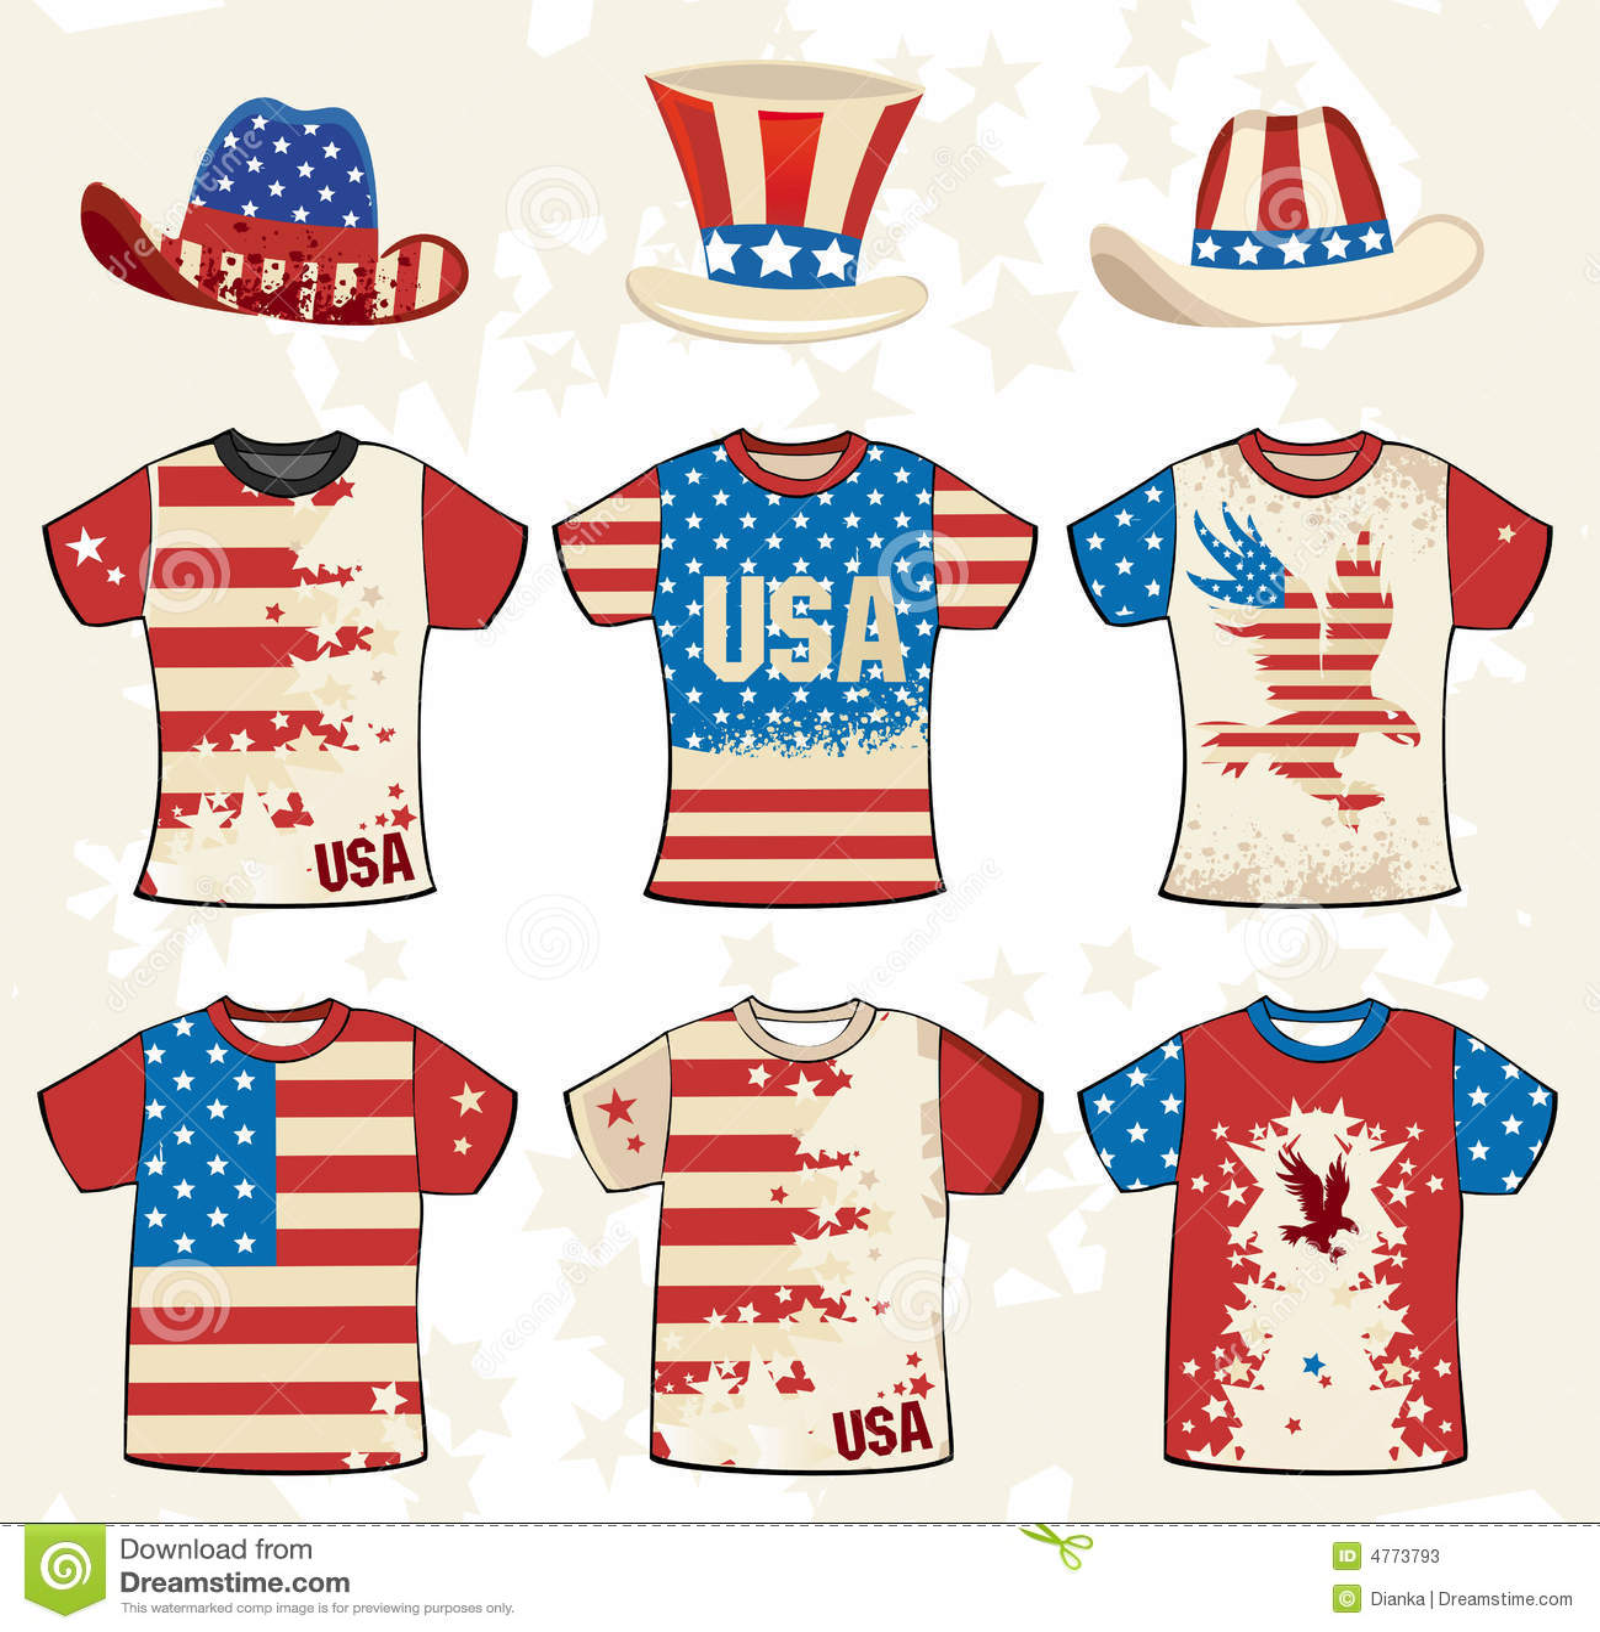 Grunge american t-shirt design